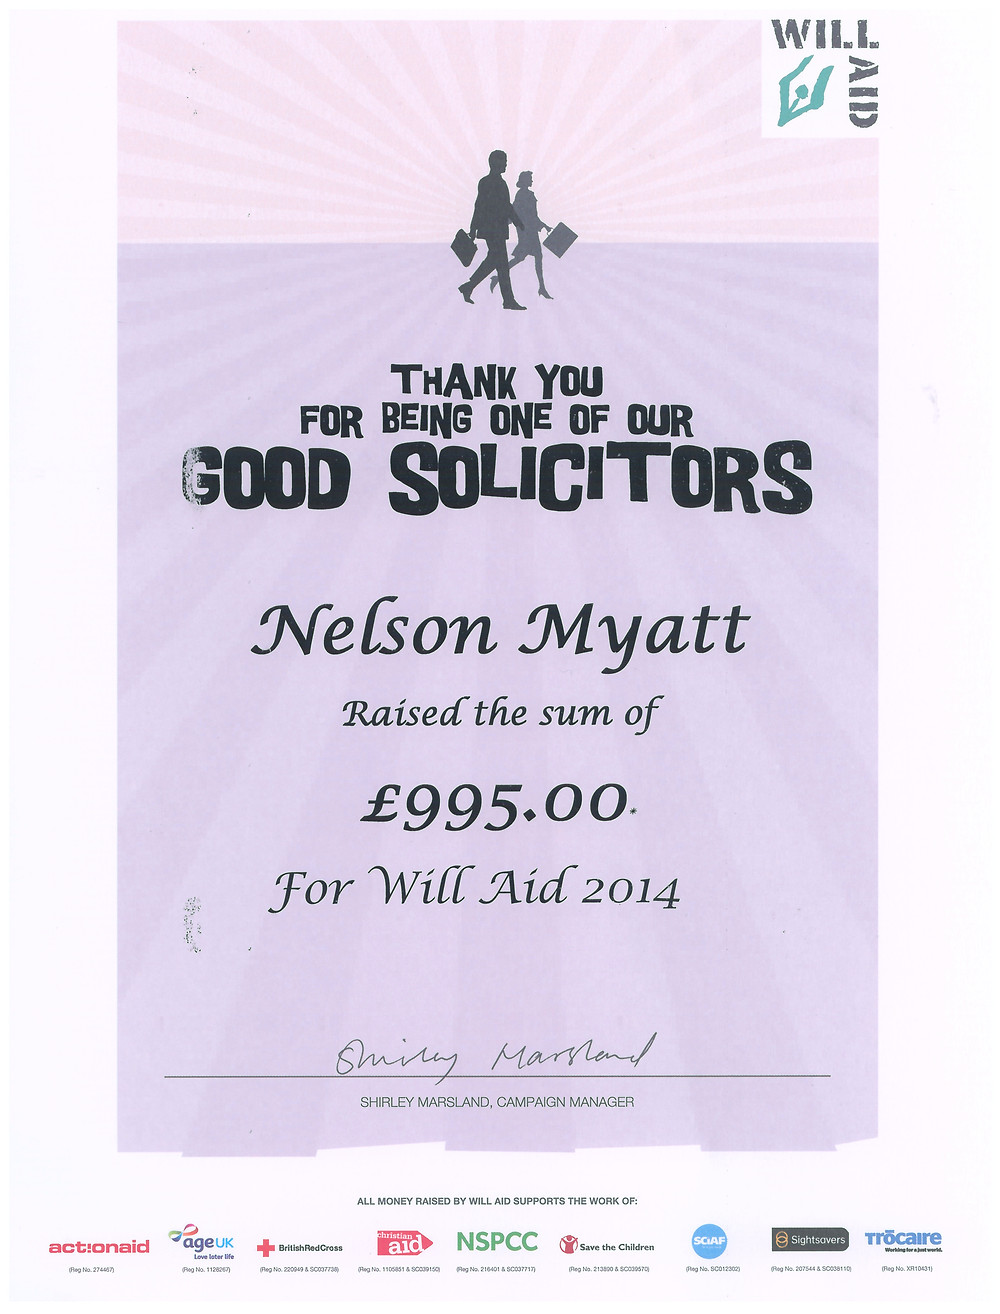 Will aid at Nelson Myatt